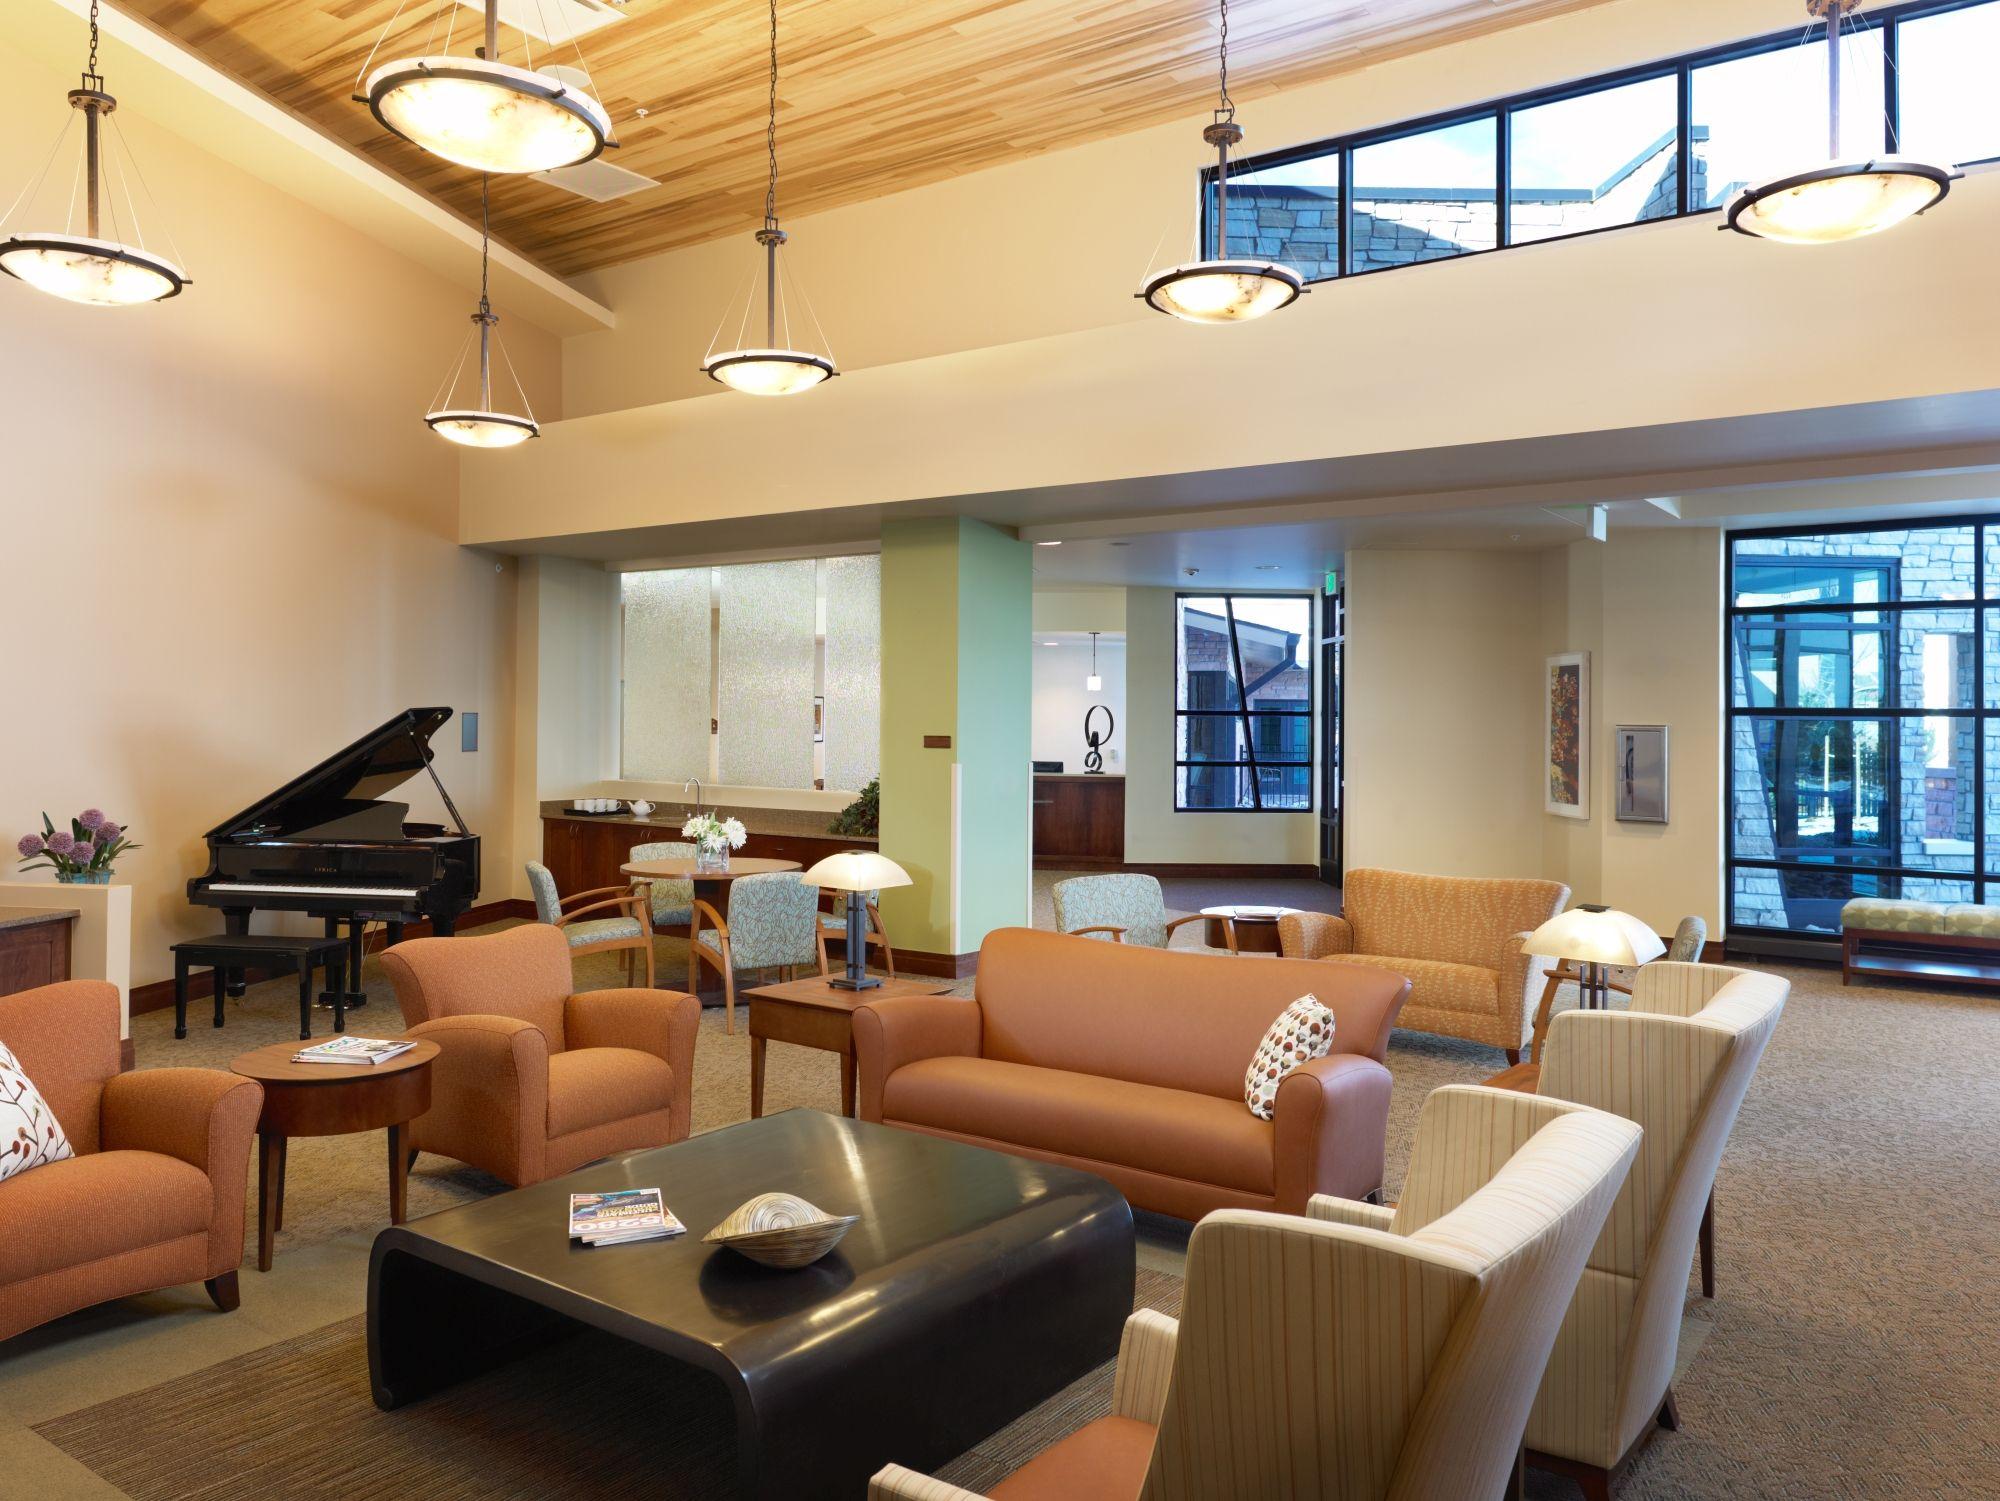 Denver Hospice Greatroom 2.jpg